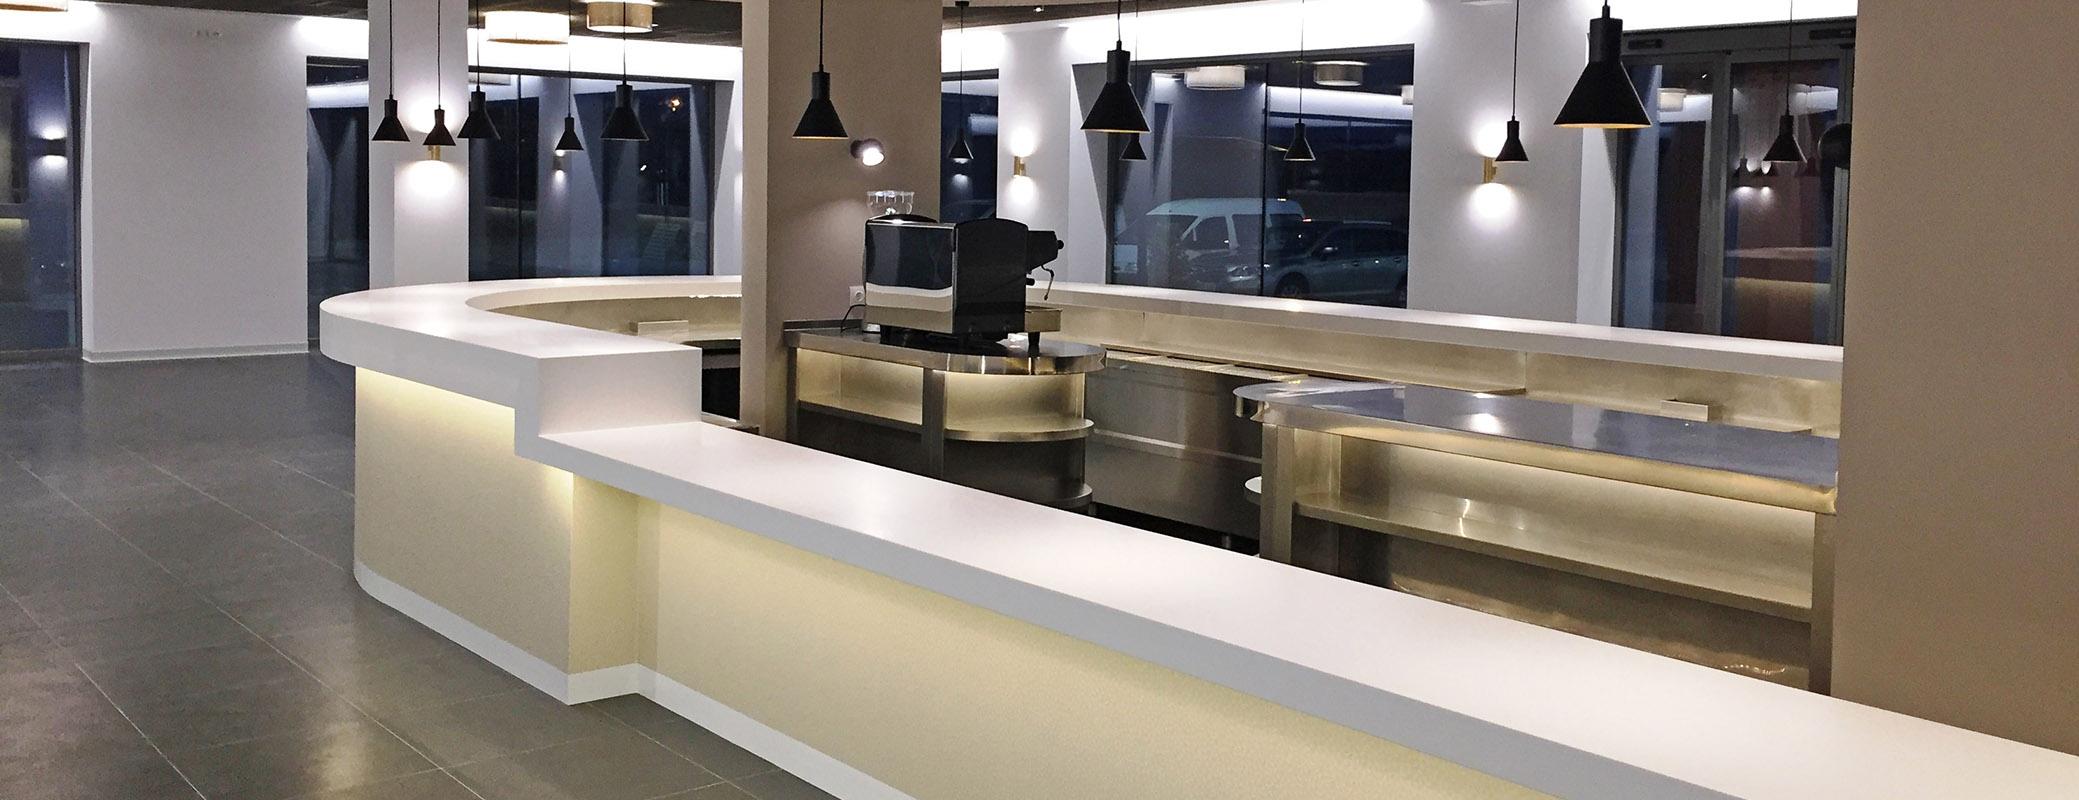 Mobiliario a medida para barras de hostelería, barras de bar de diseño en Krion